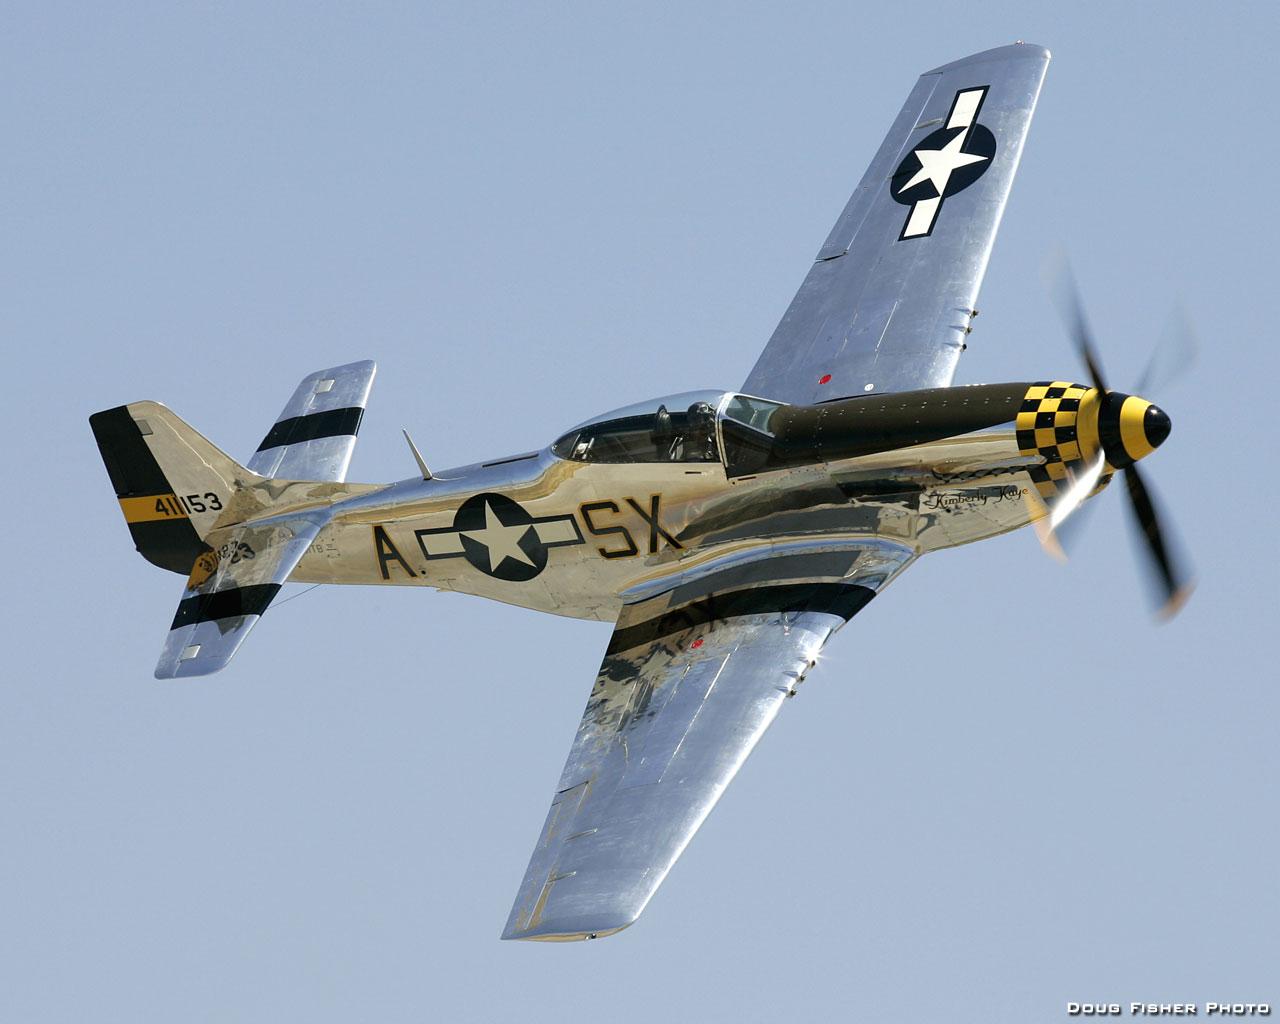 ... stammt vom Kampfflugzeug P51 Mustang (Bild: Doug Fisher)